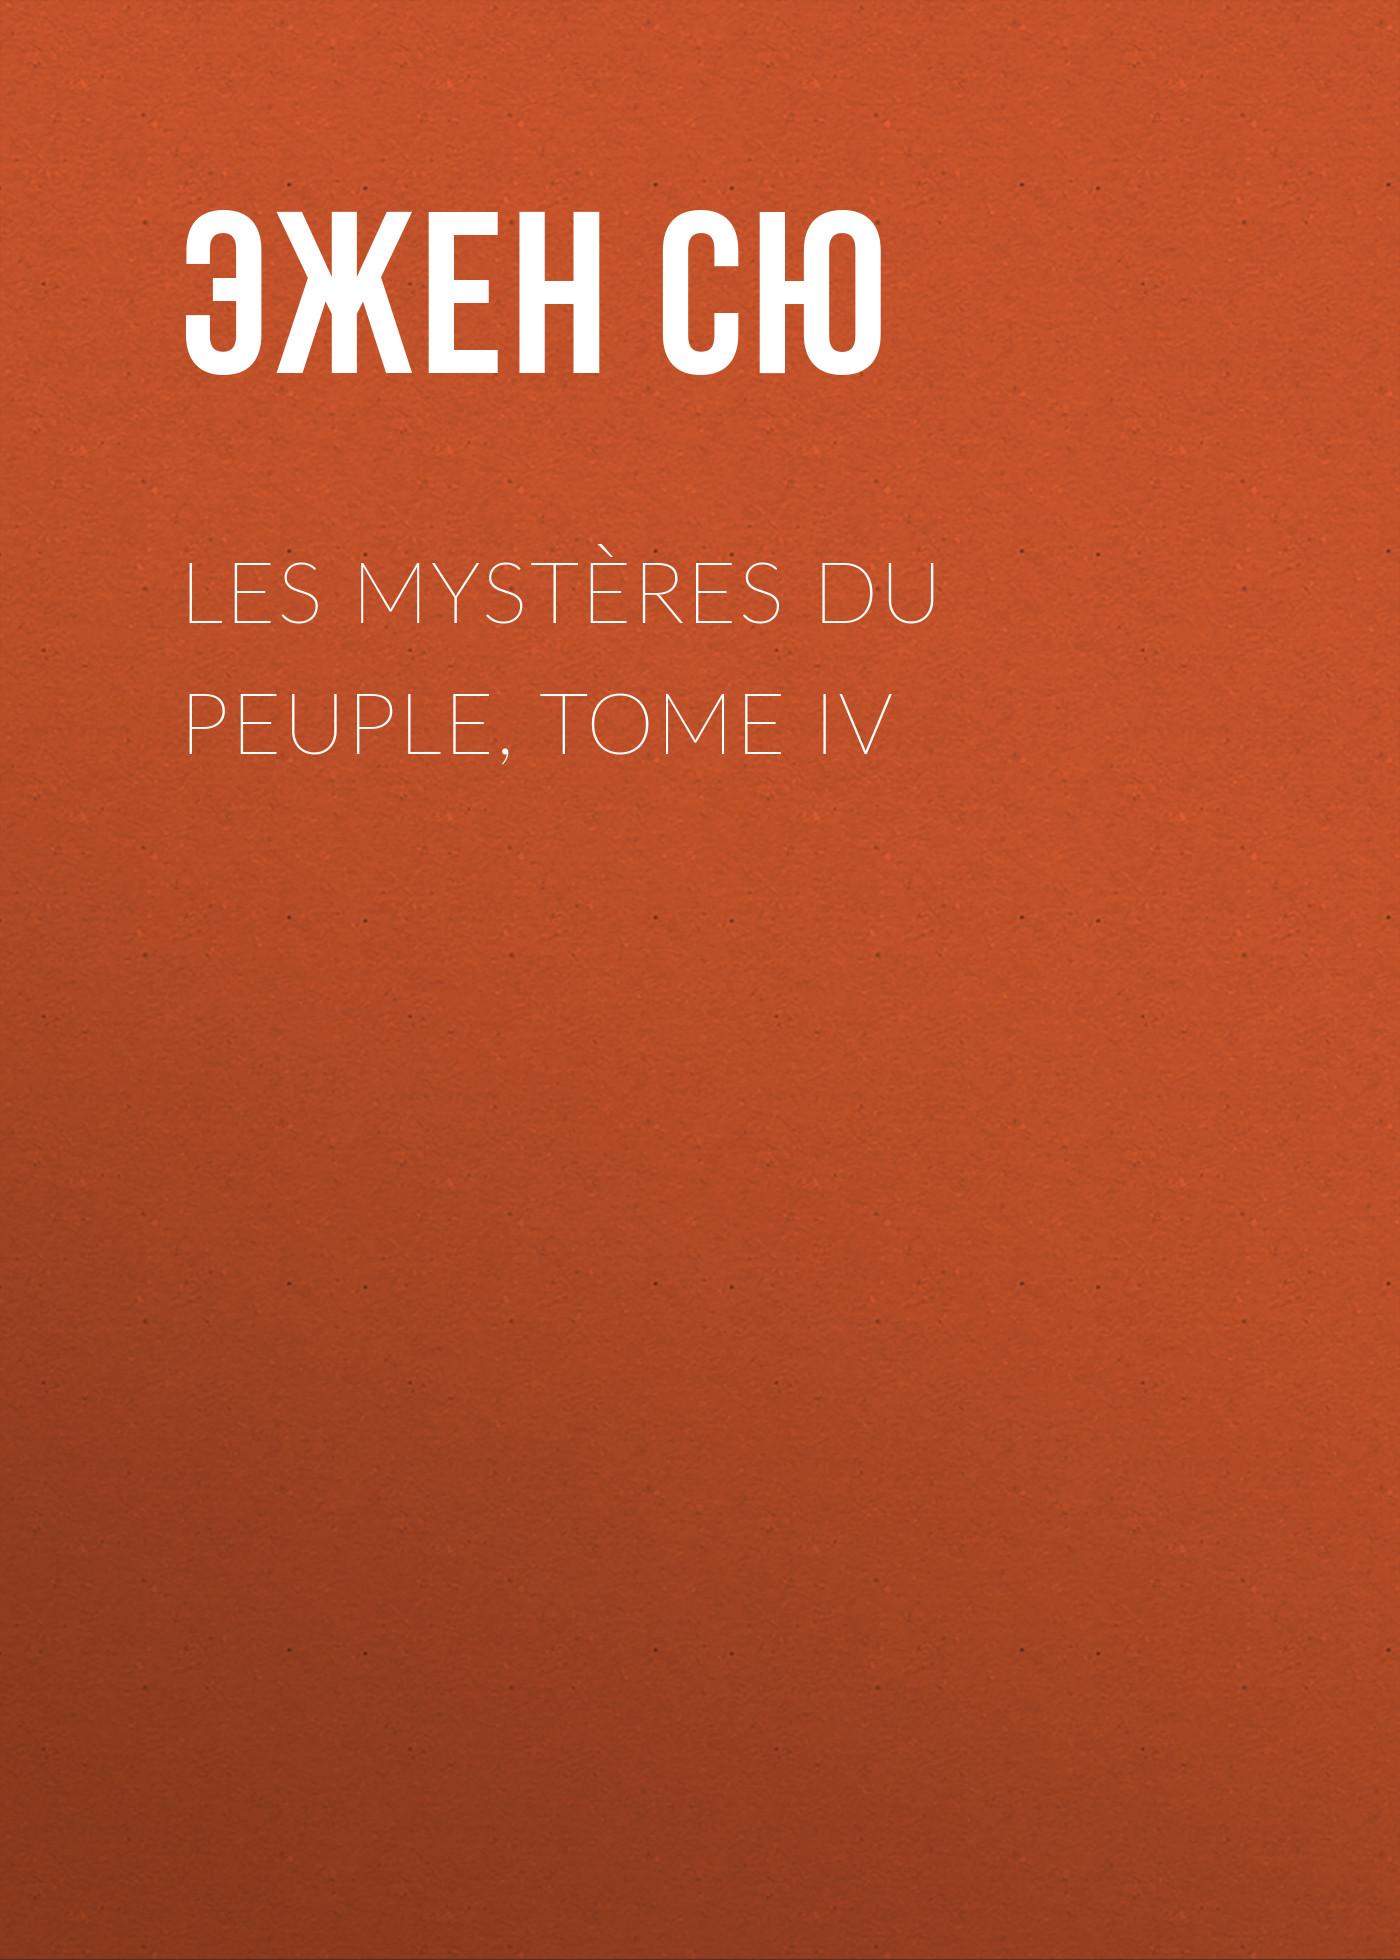 Эжен Сю Les mystères du peuple, Tome IV les quarante cinq tome ii